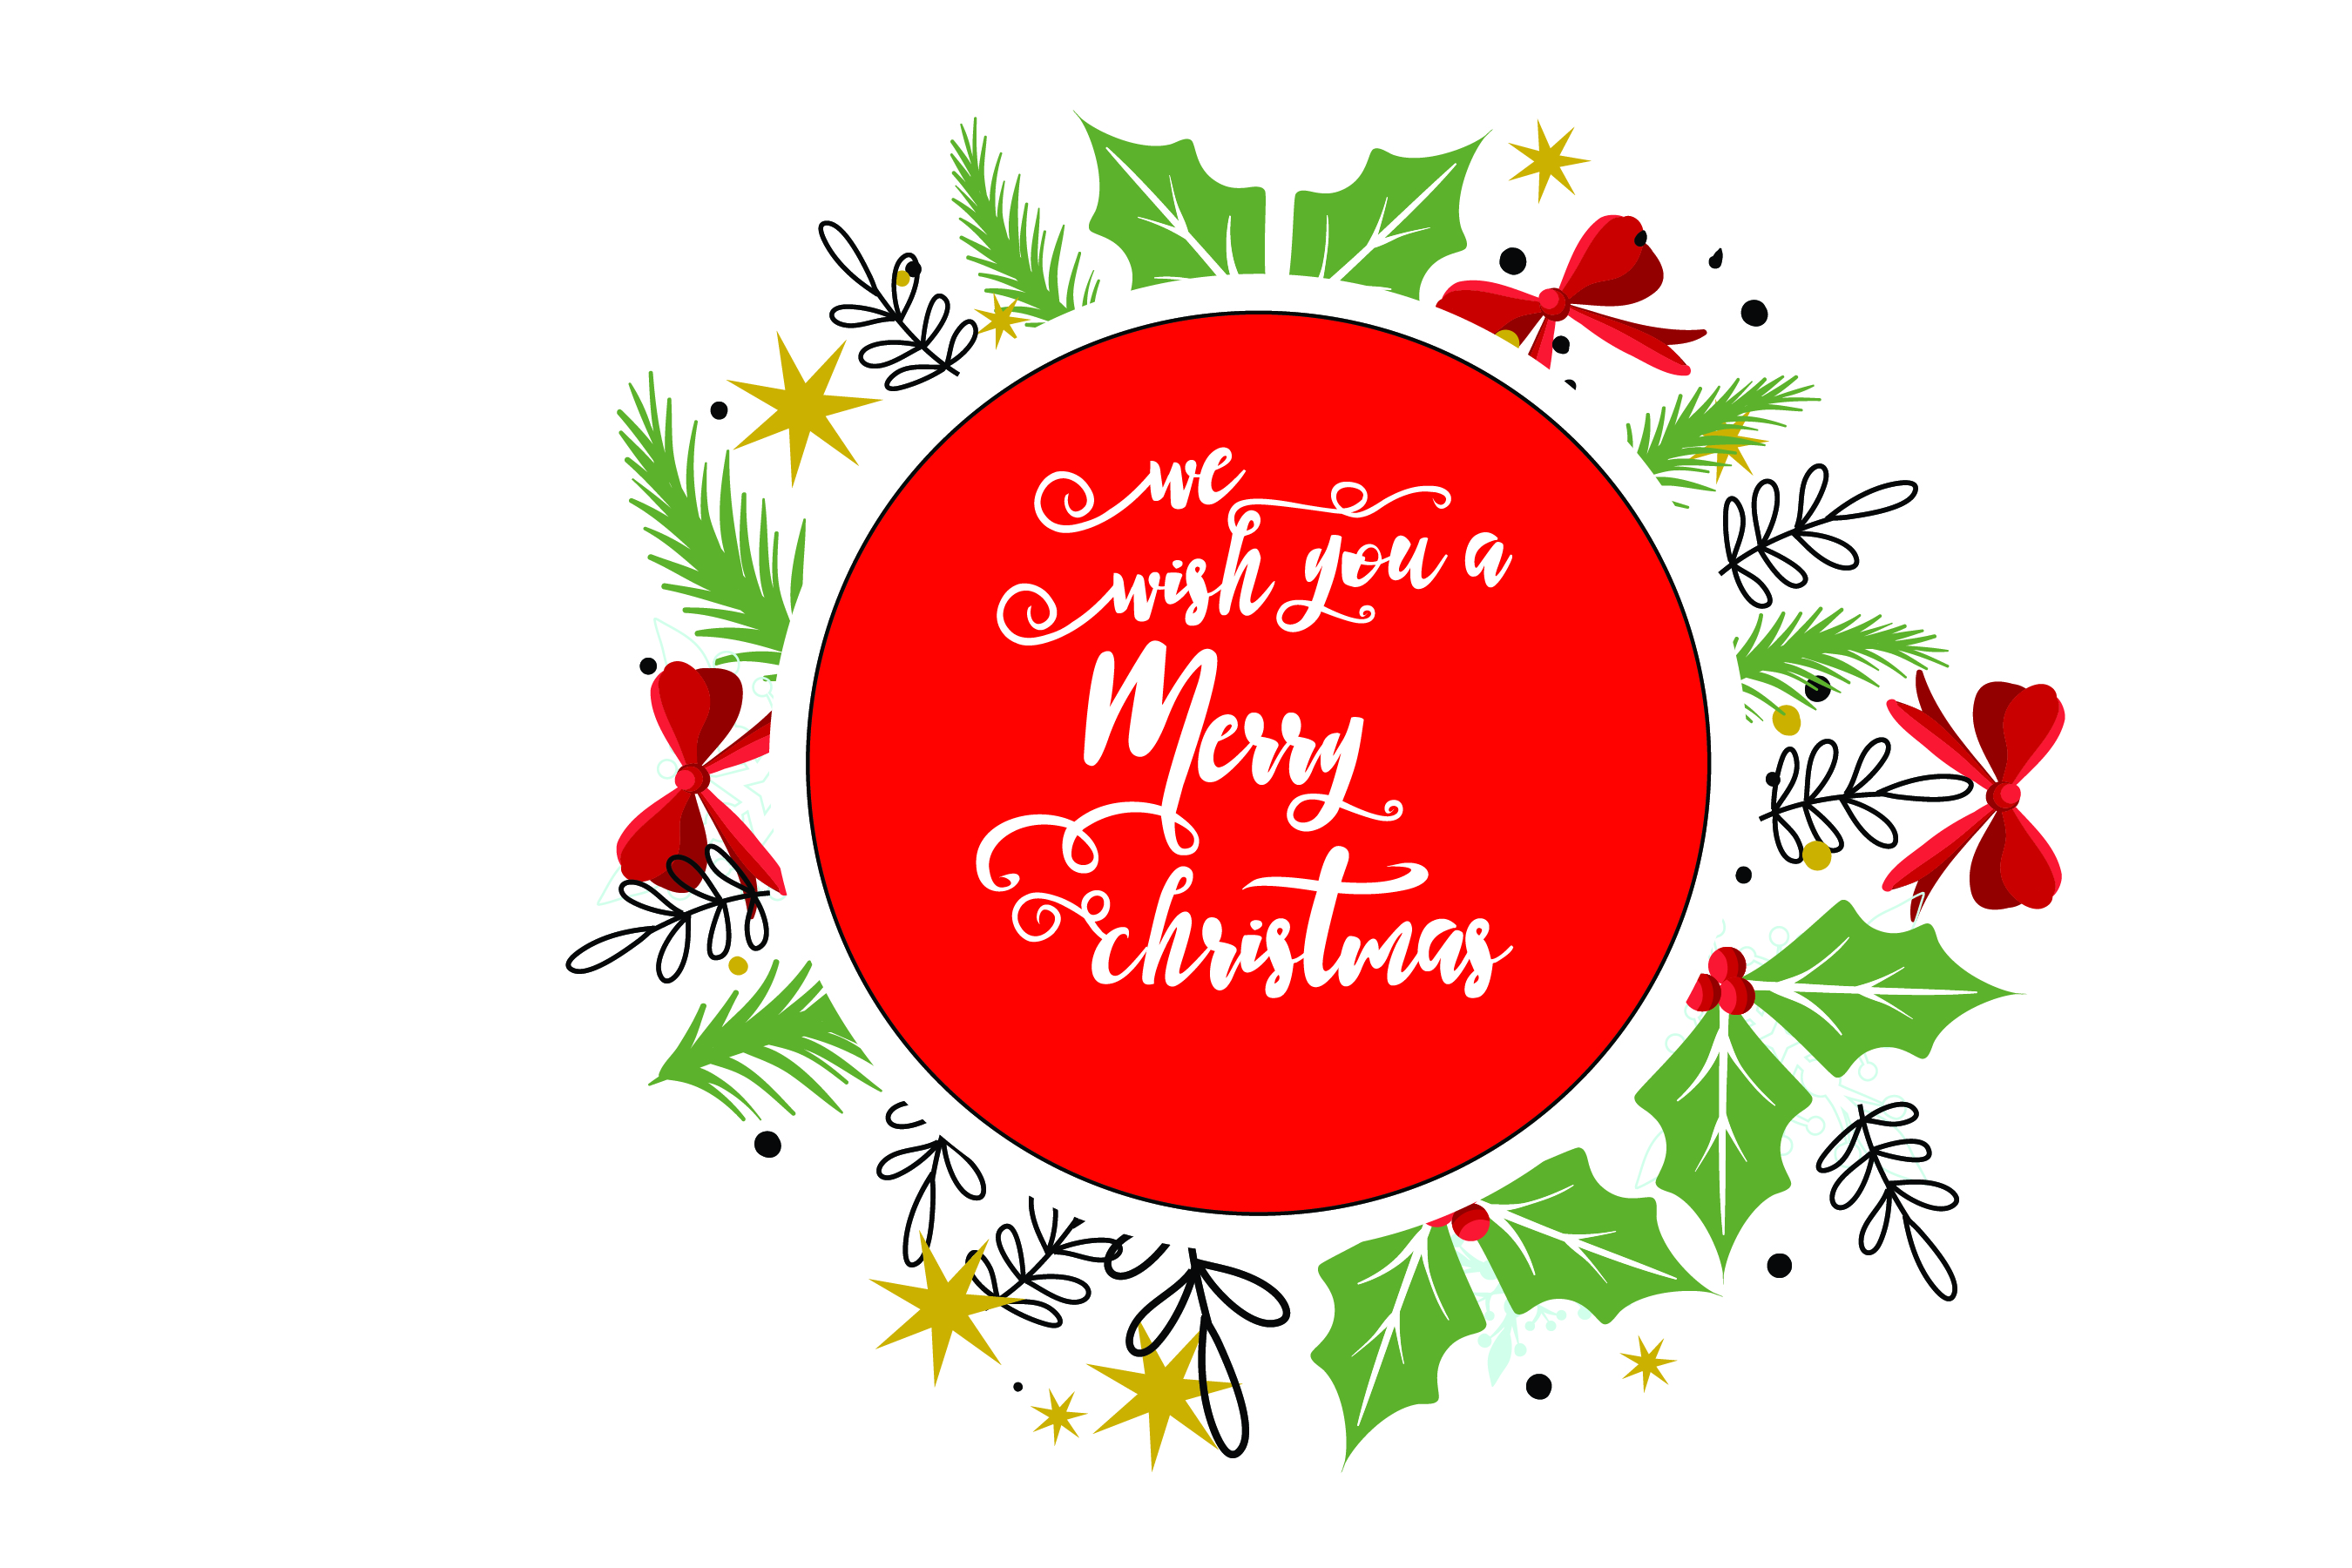 Merry Christmas-SVG Cut File-Coffee Mug Design-Greeting Card example image 3